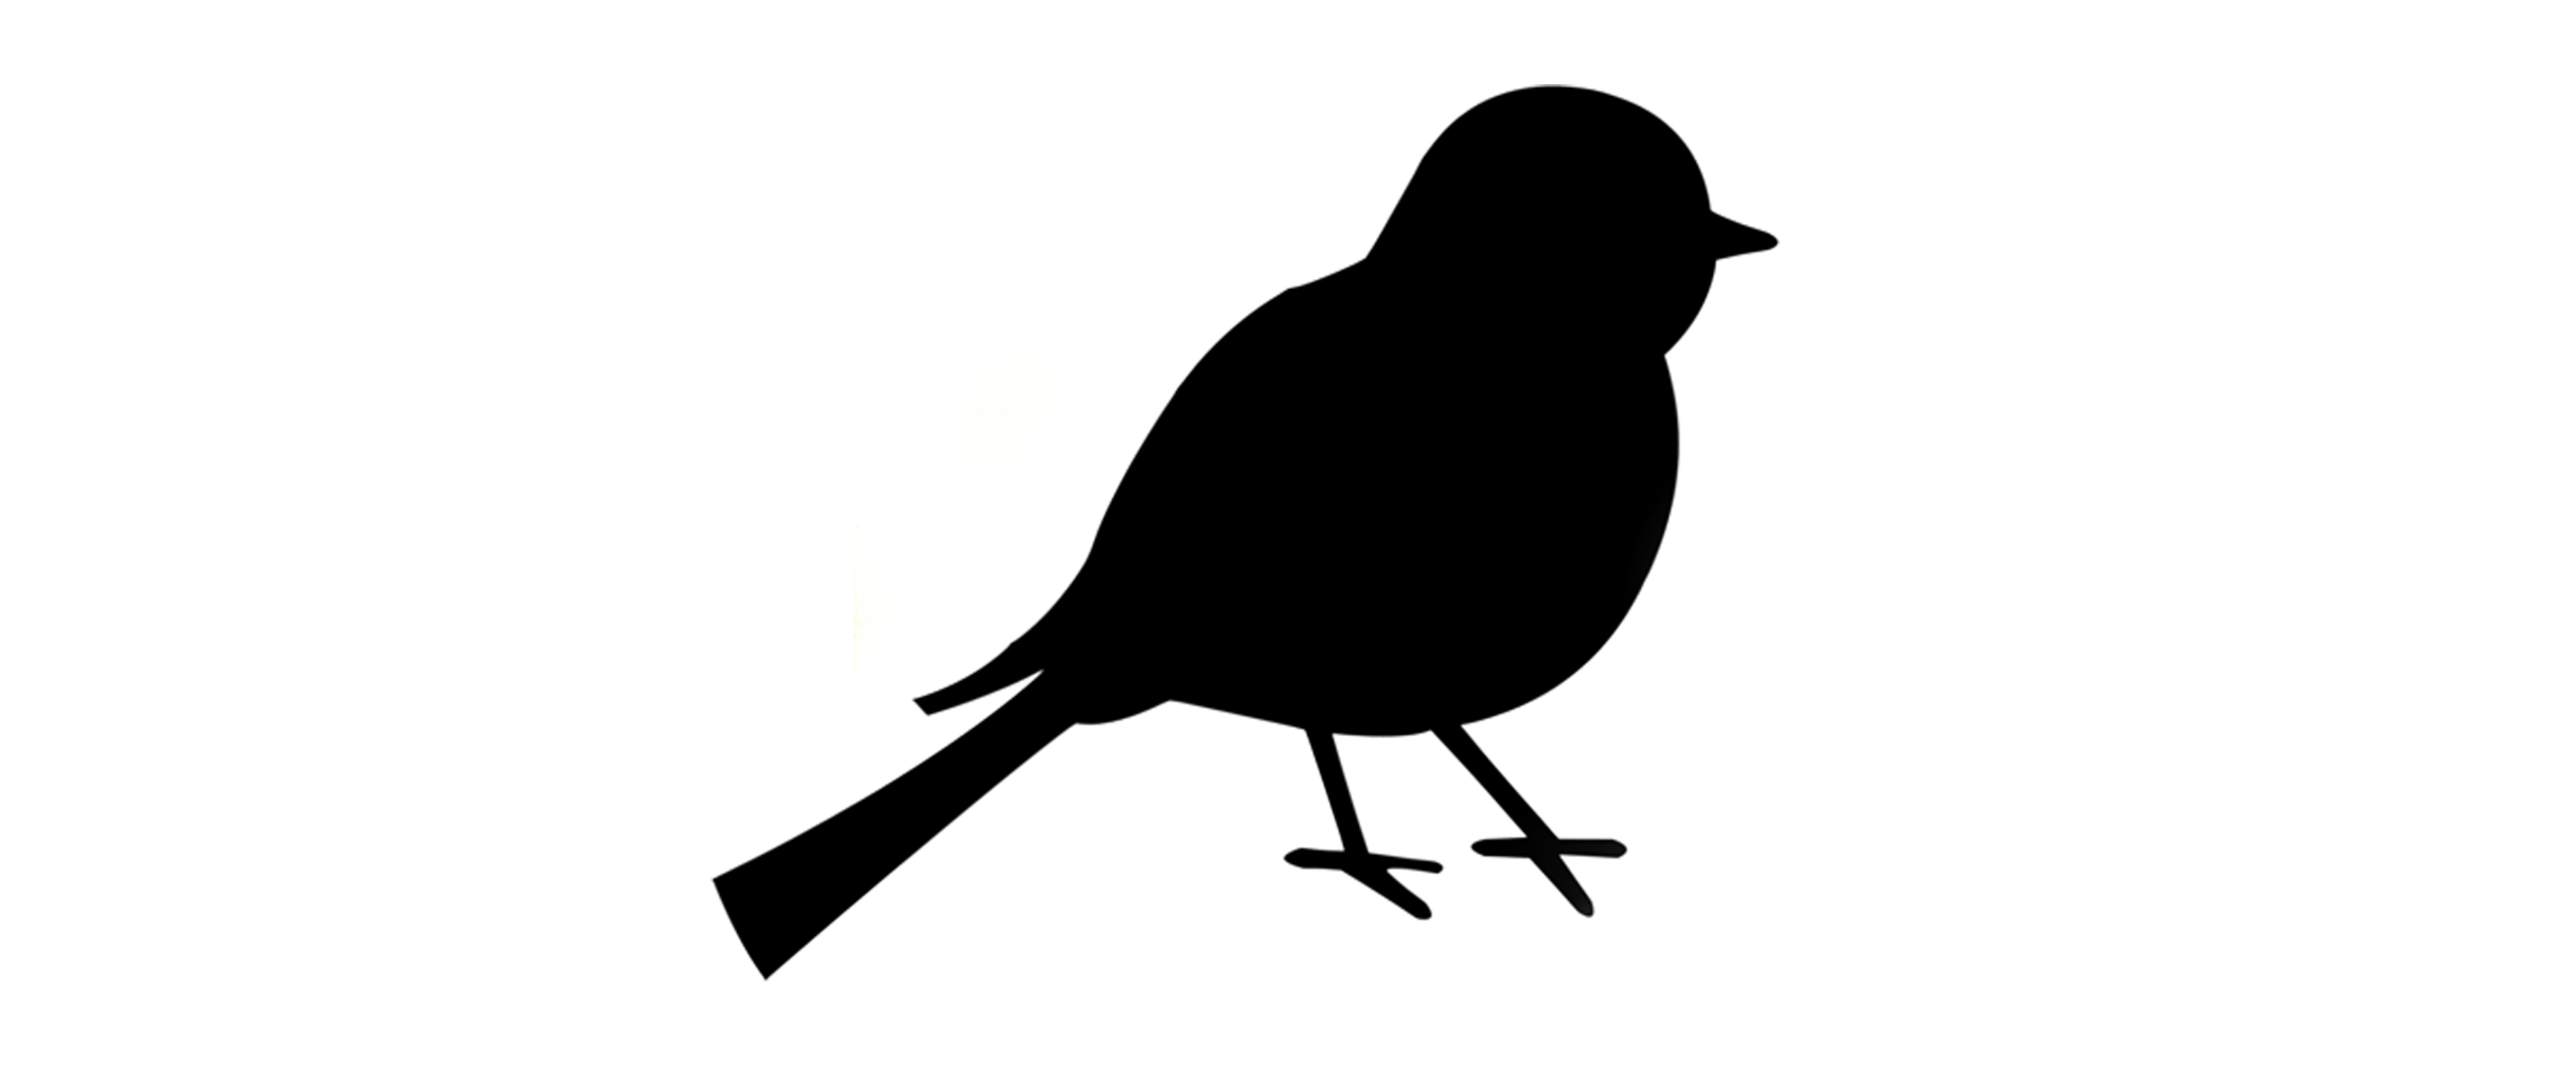 Graphic Designs Images 18 Graphic Bird Images